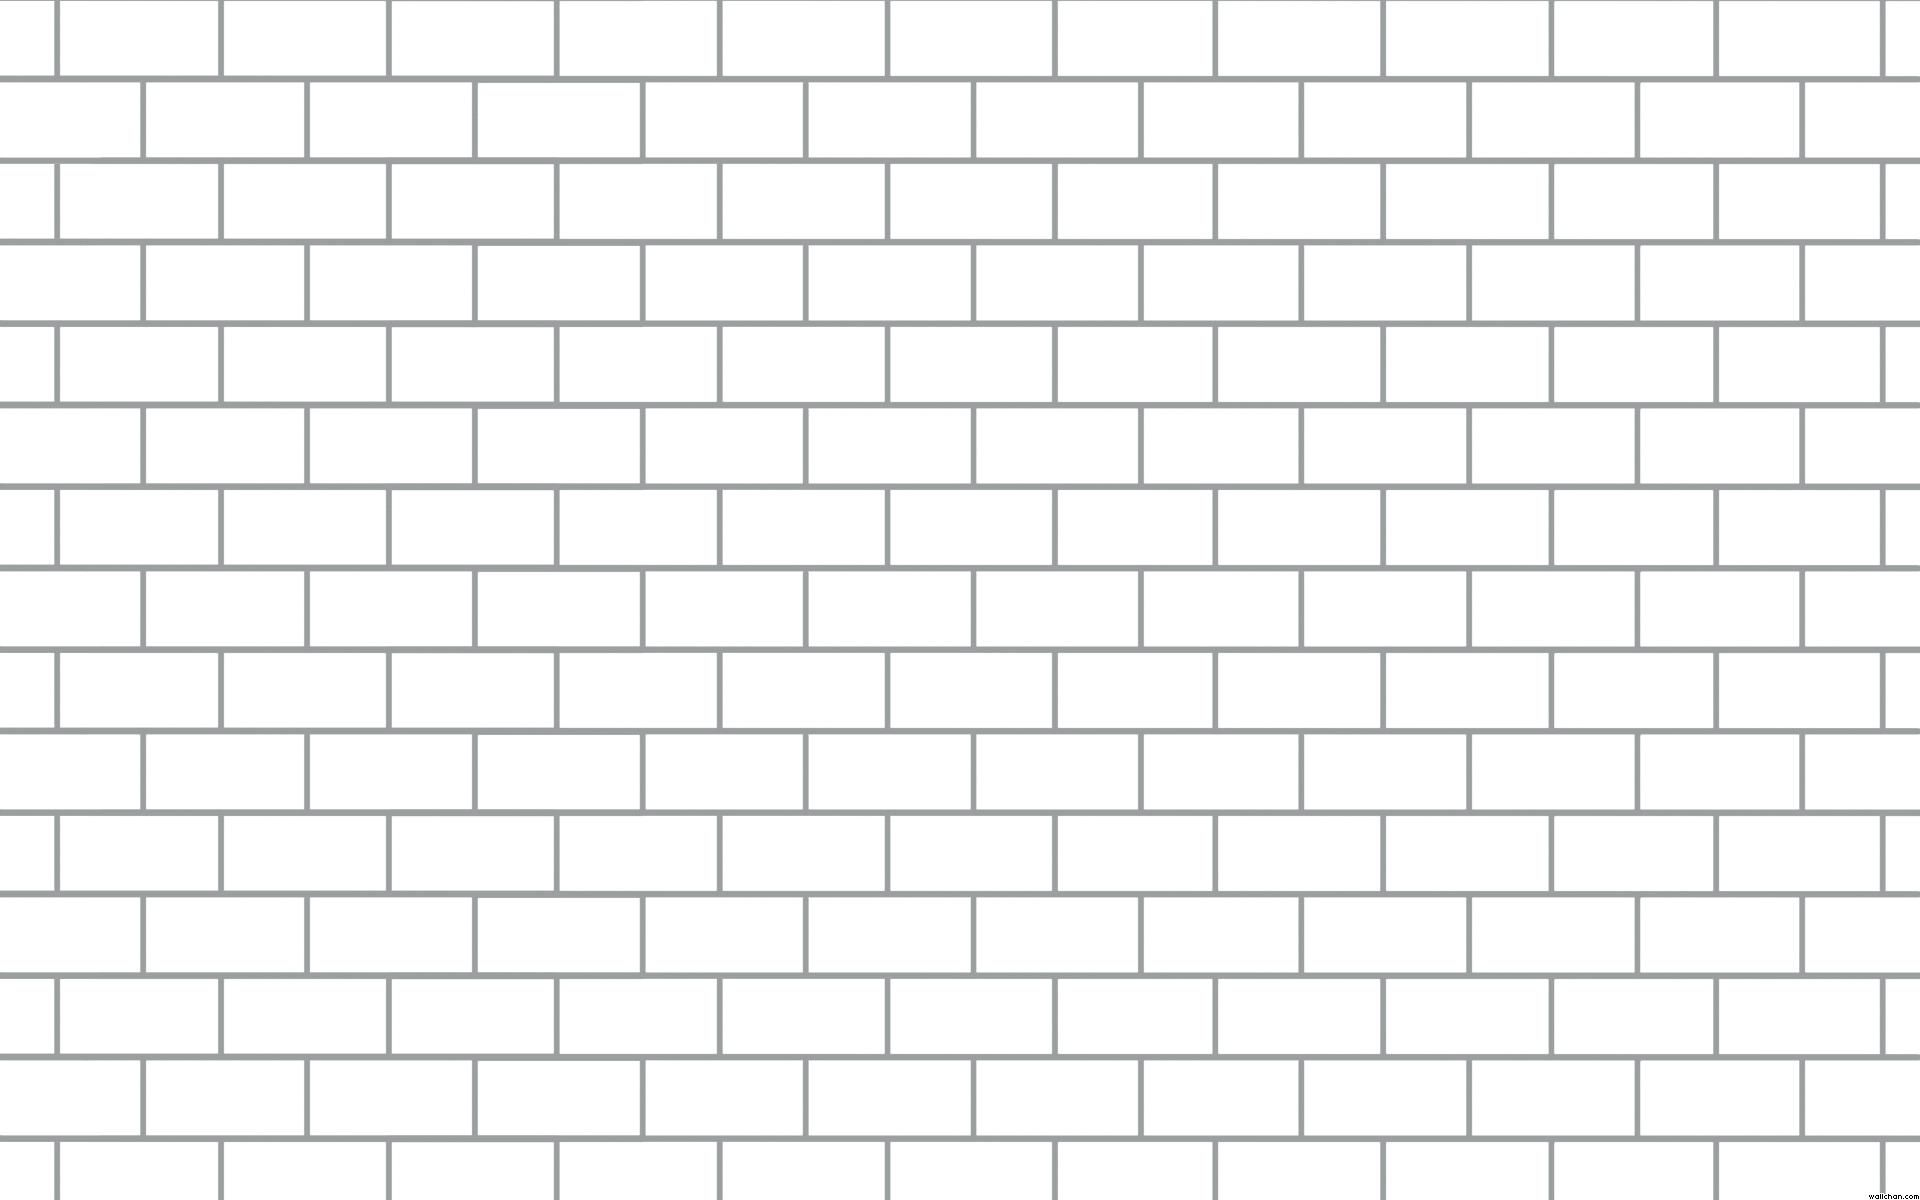 printable brick wall coloring pages - photo#7